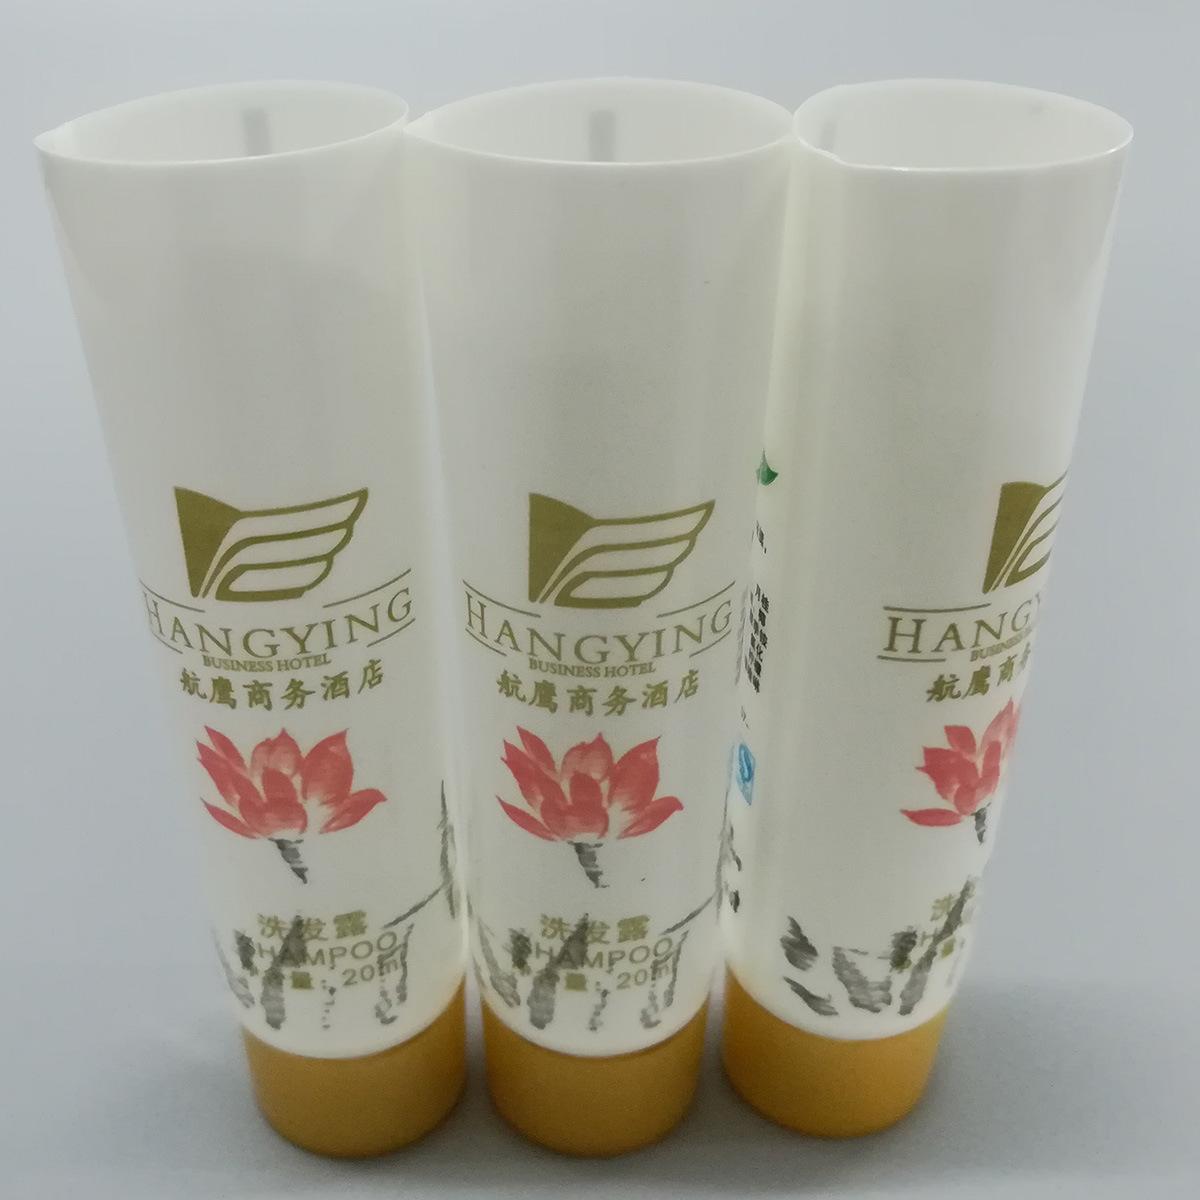 Pbl Tubes for Shampoo Plastic Tubes